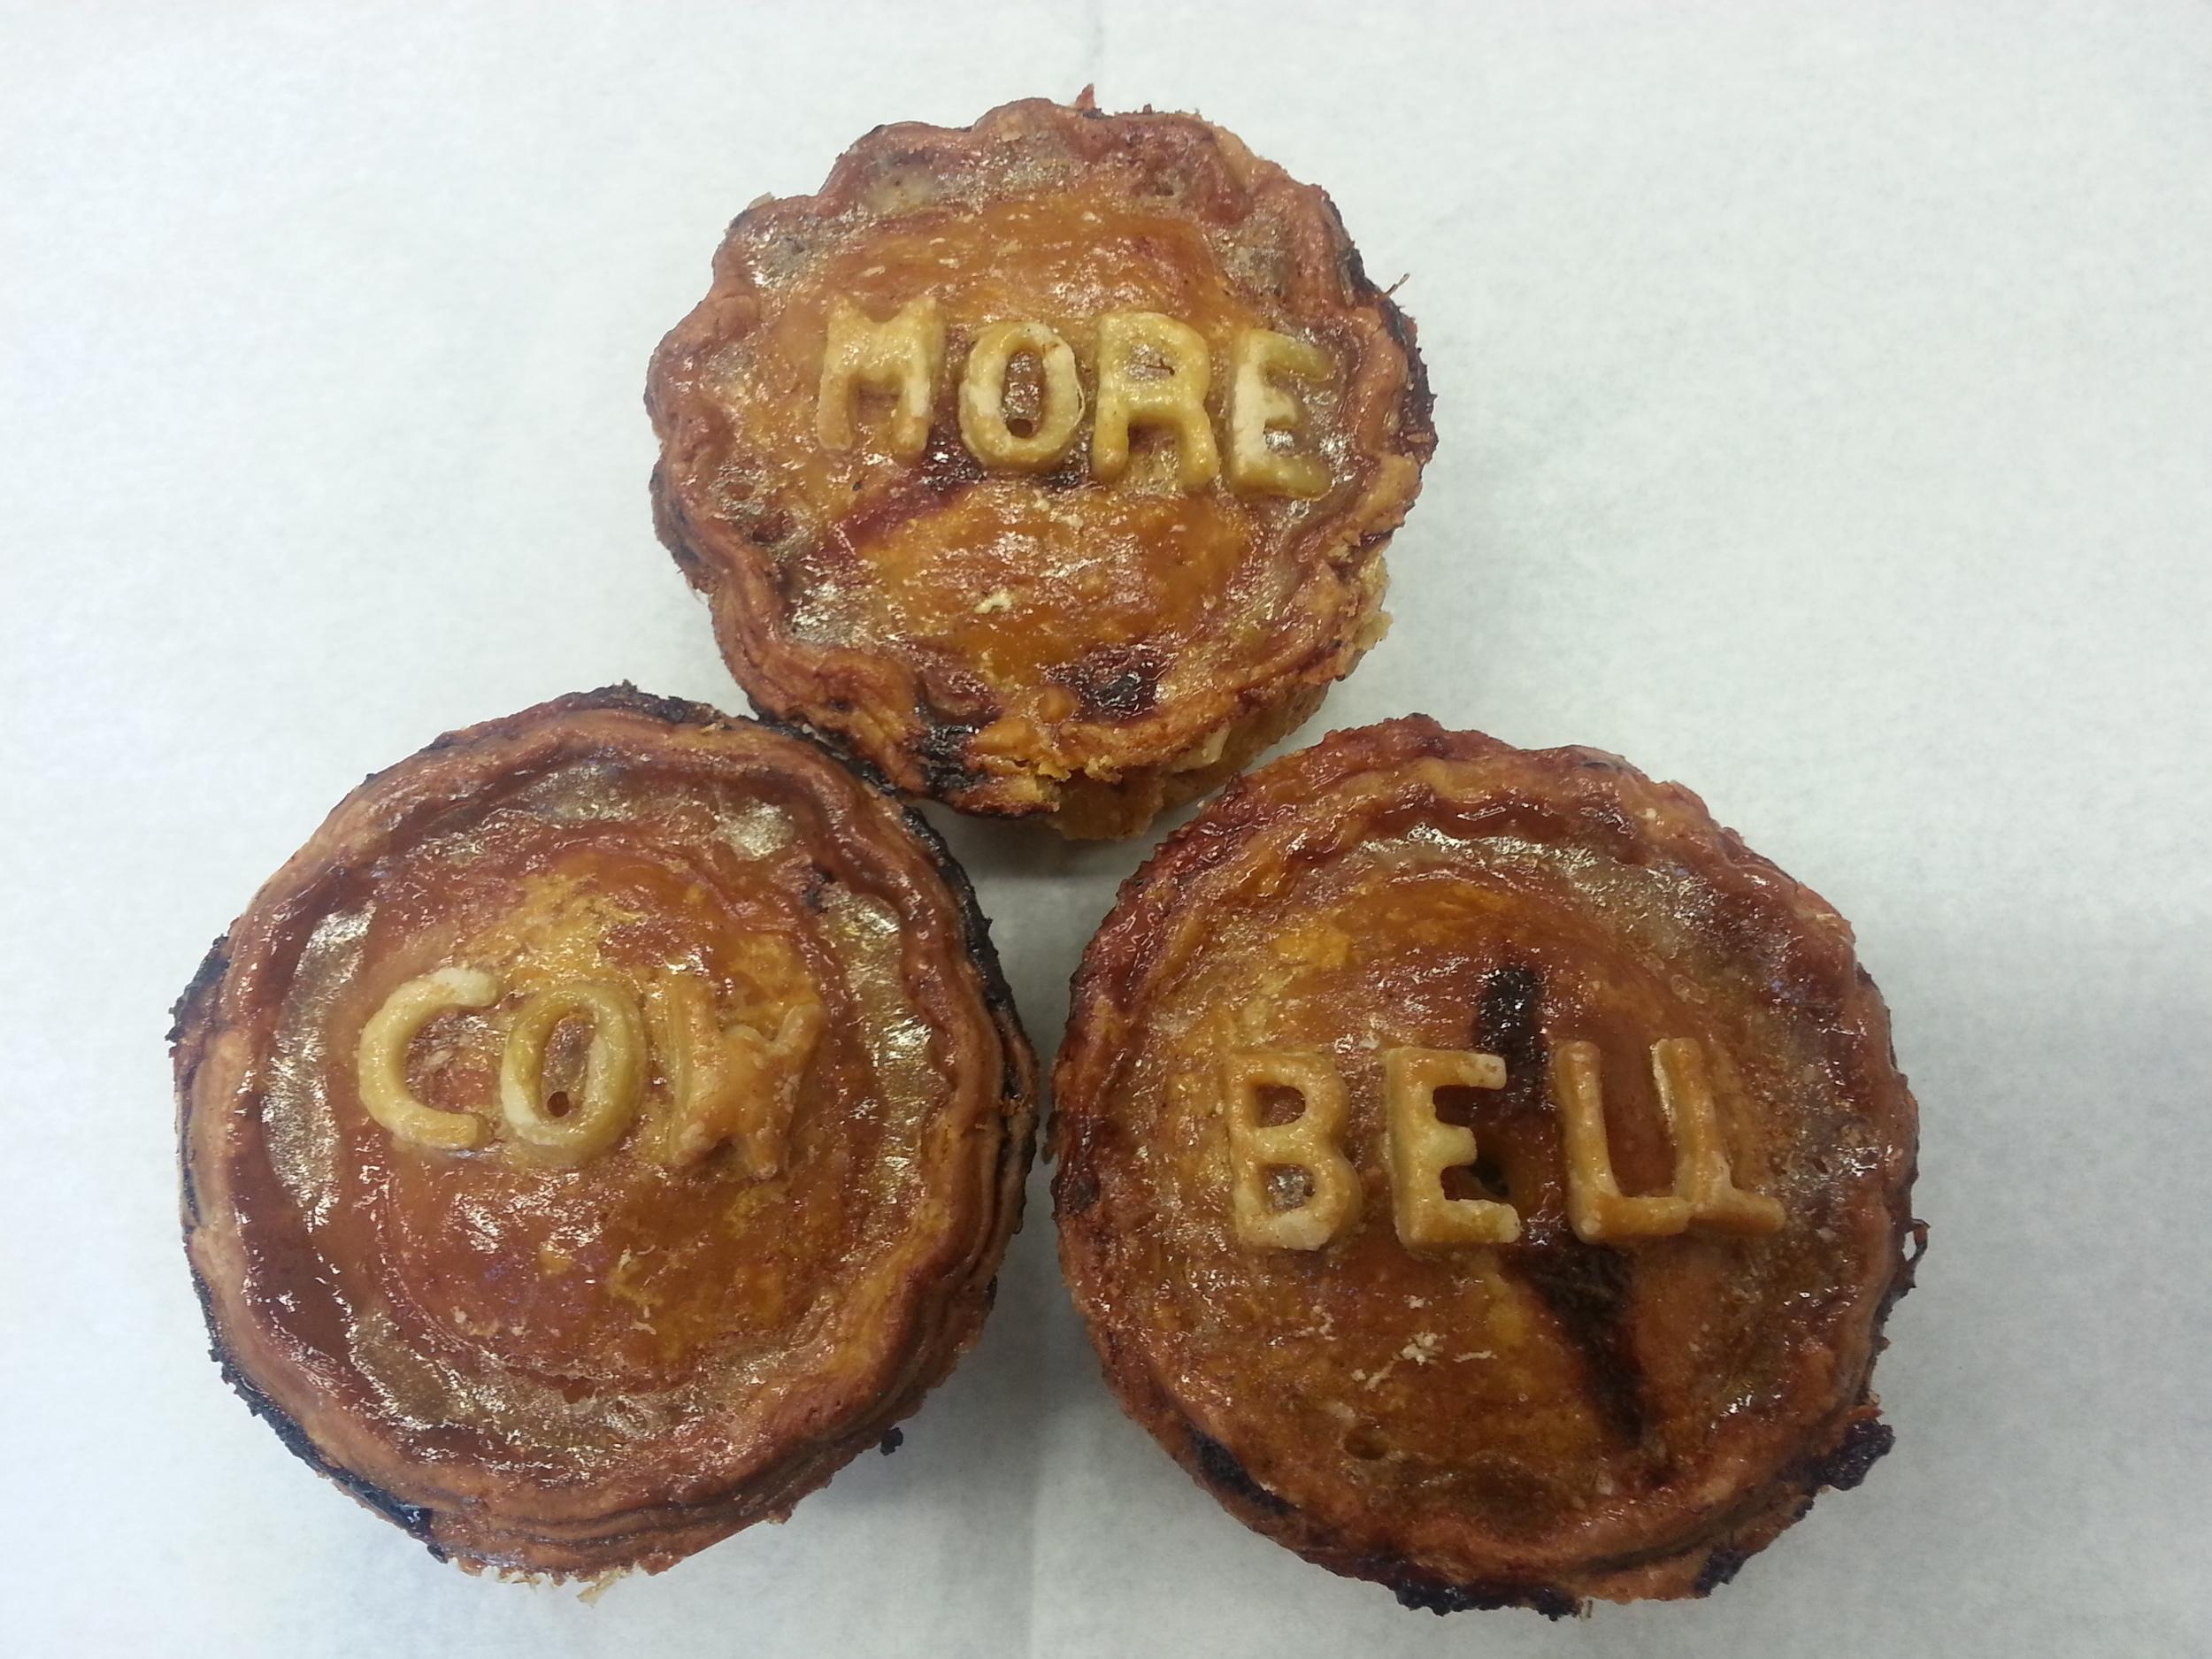 Celebration Pork Pies